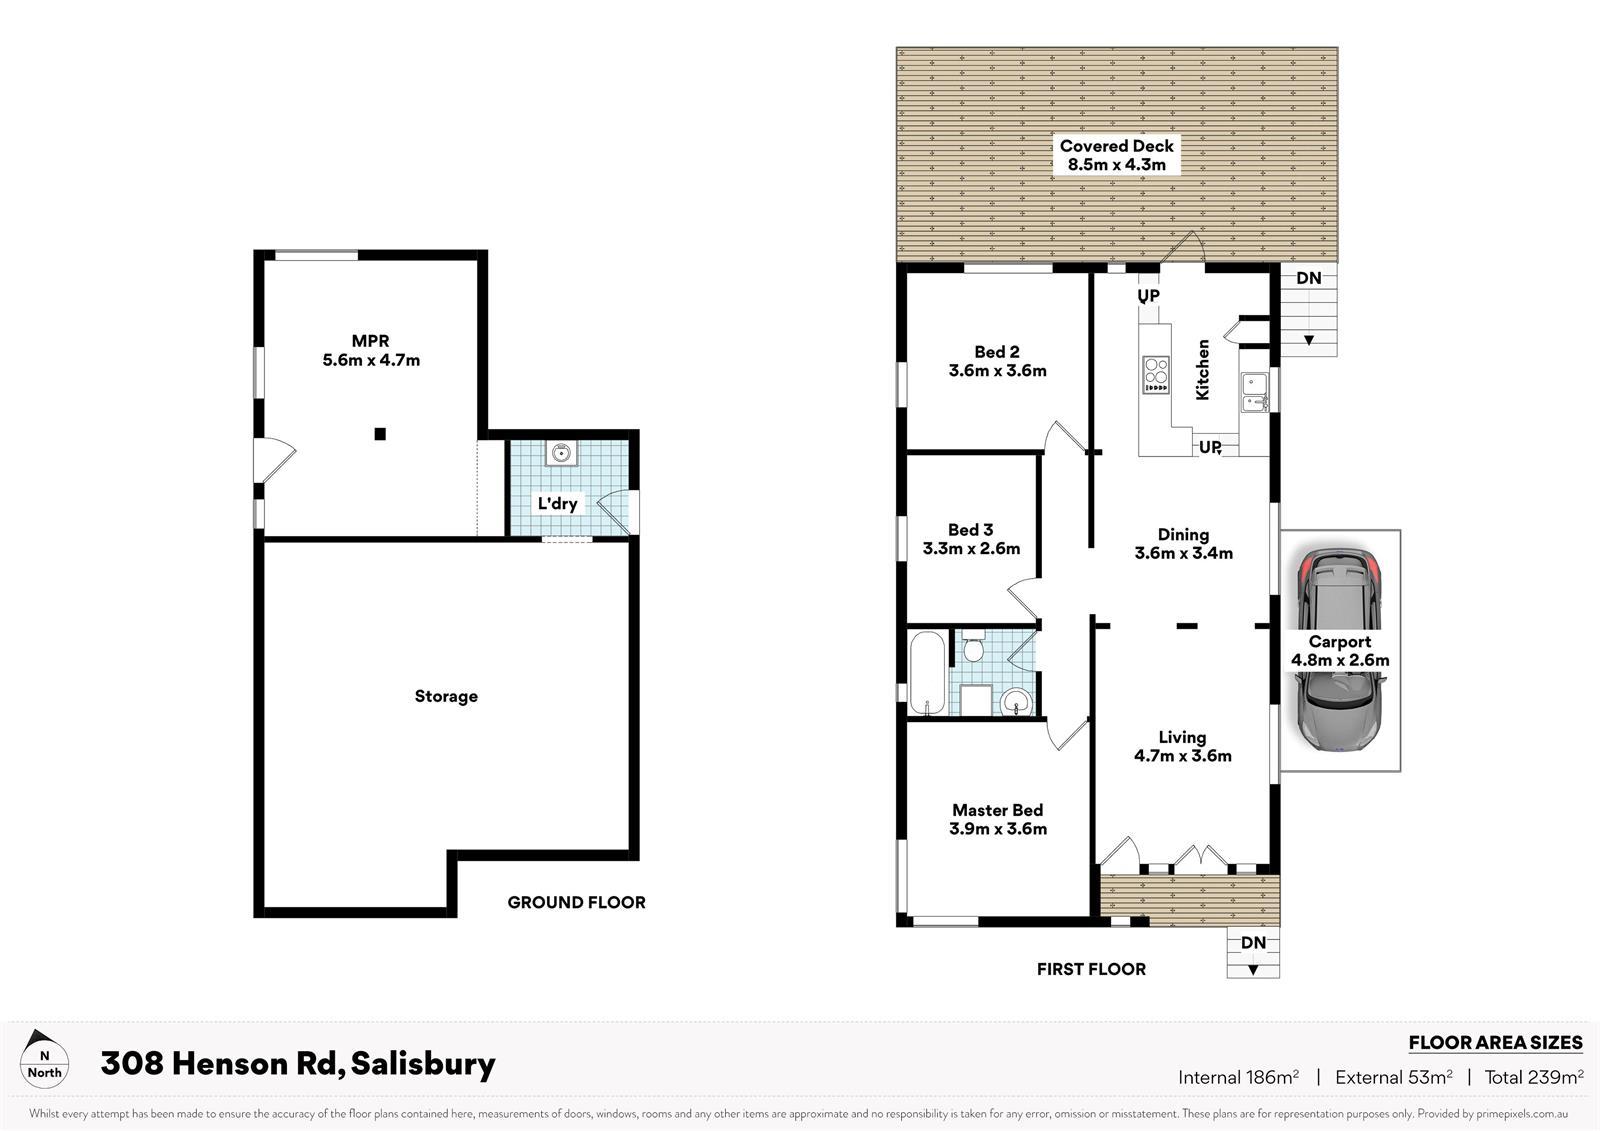 308 Henson Rd SALISBURY QLD 4107 Floorplan 1